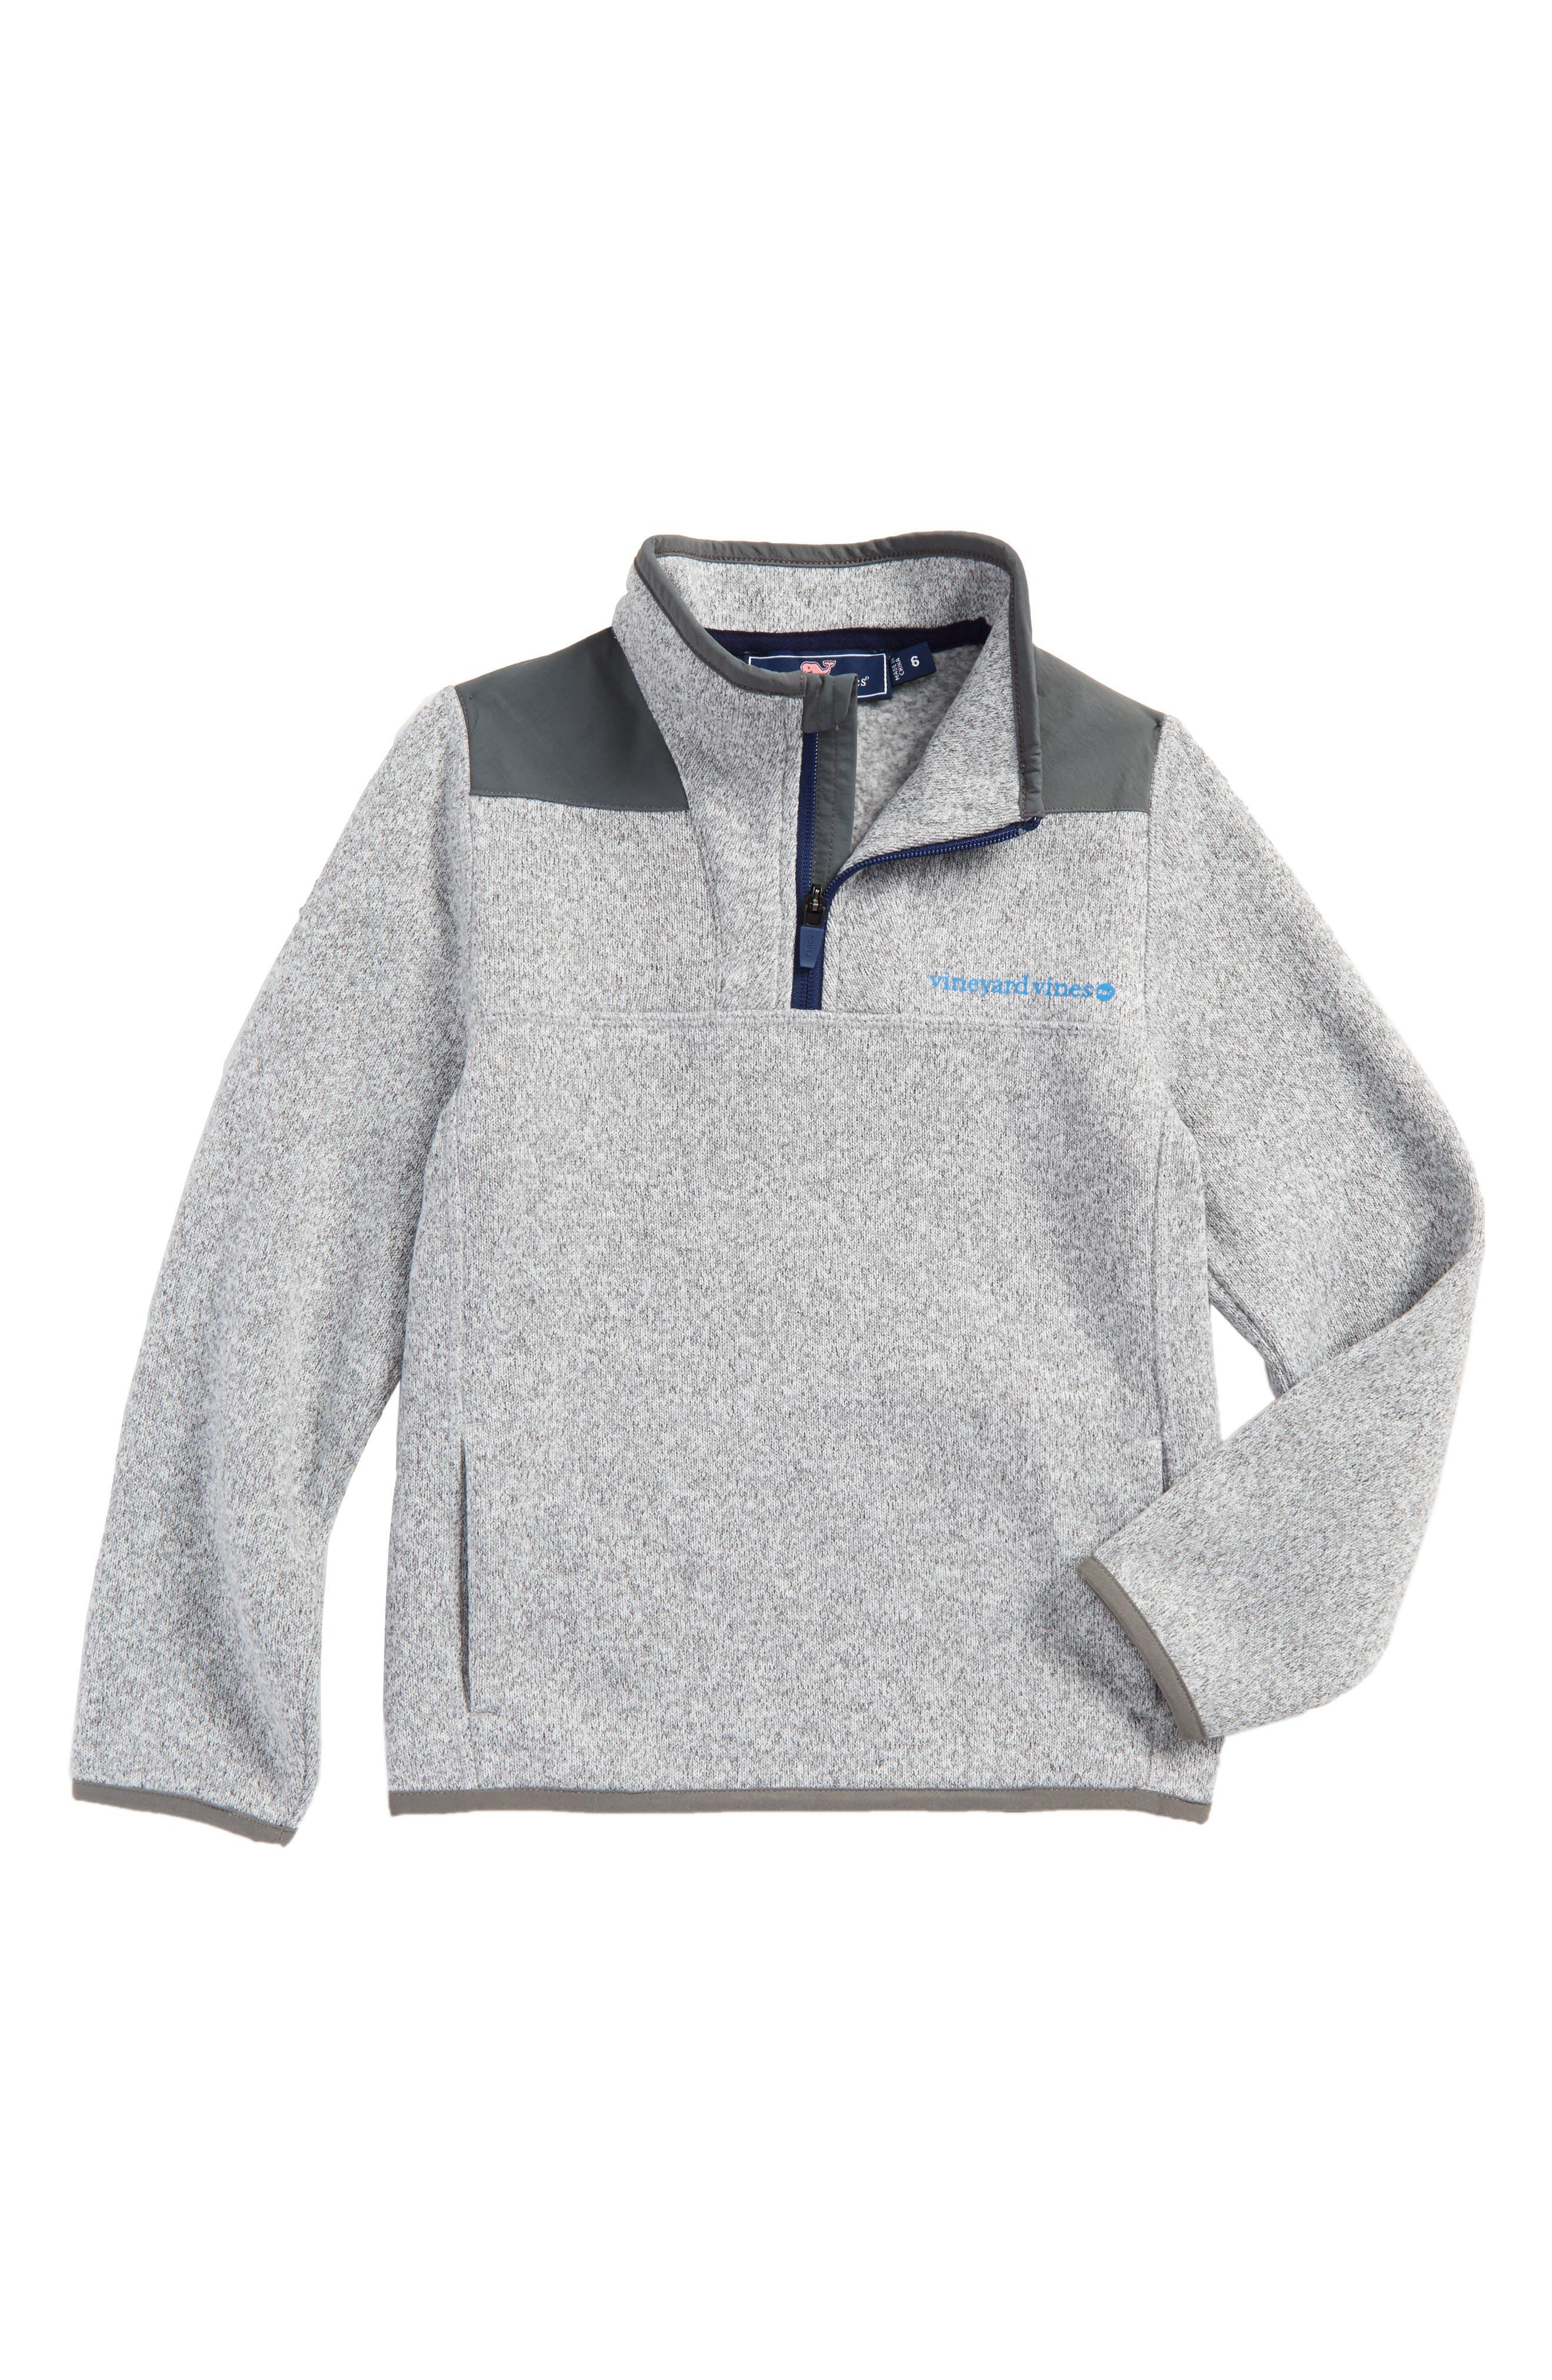 Quarter Zip Sweater,                         Main,                         color, Gray Heather